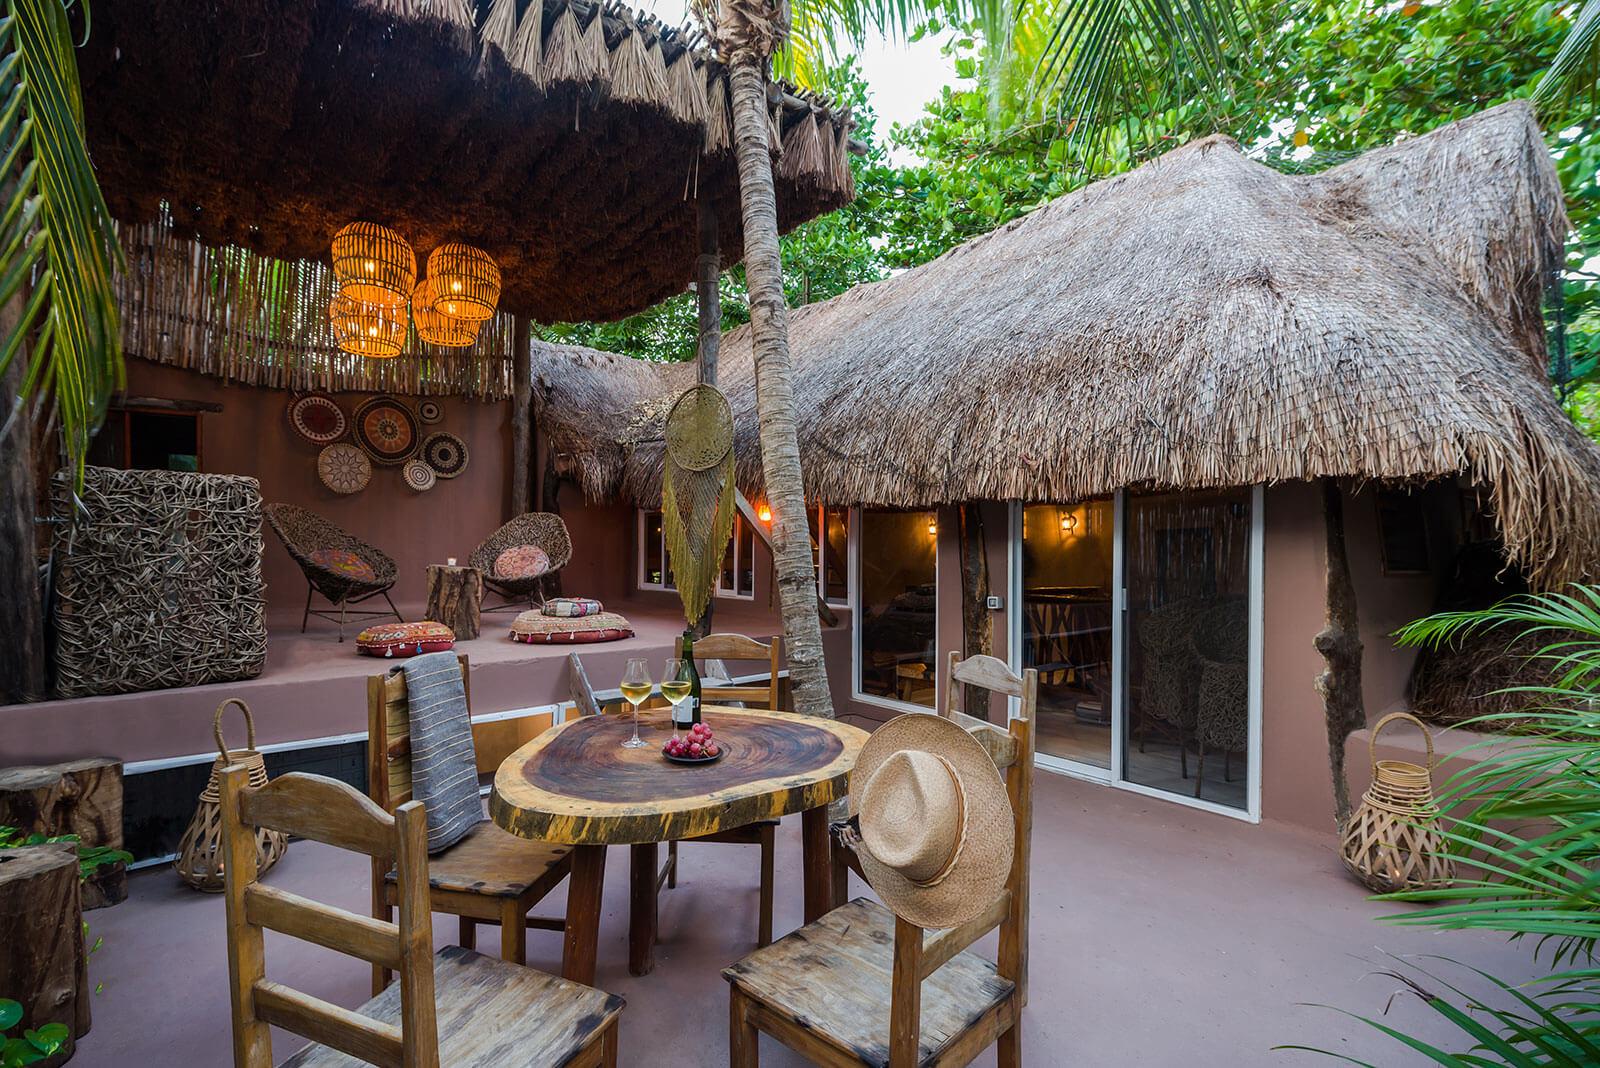 Maya_Luxe_Riviera_Maya_Luxury_Vacations_Villa_Rentals_Tulum_Playa_del_Carmen_Mexico_Bejuco_House_7.jpg